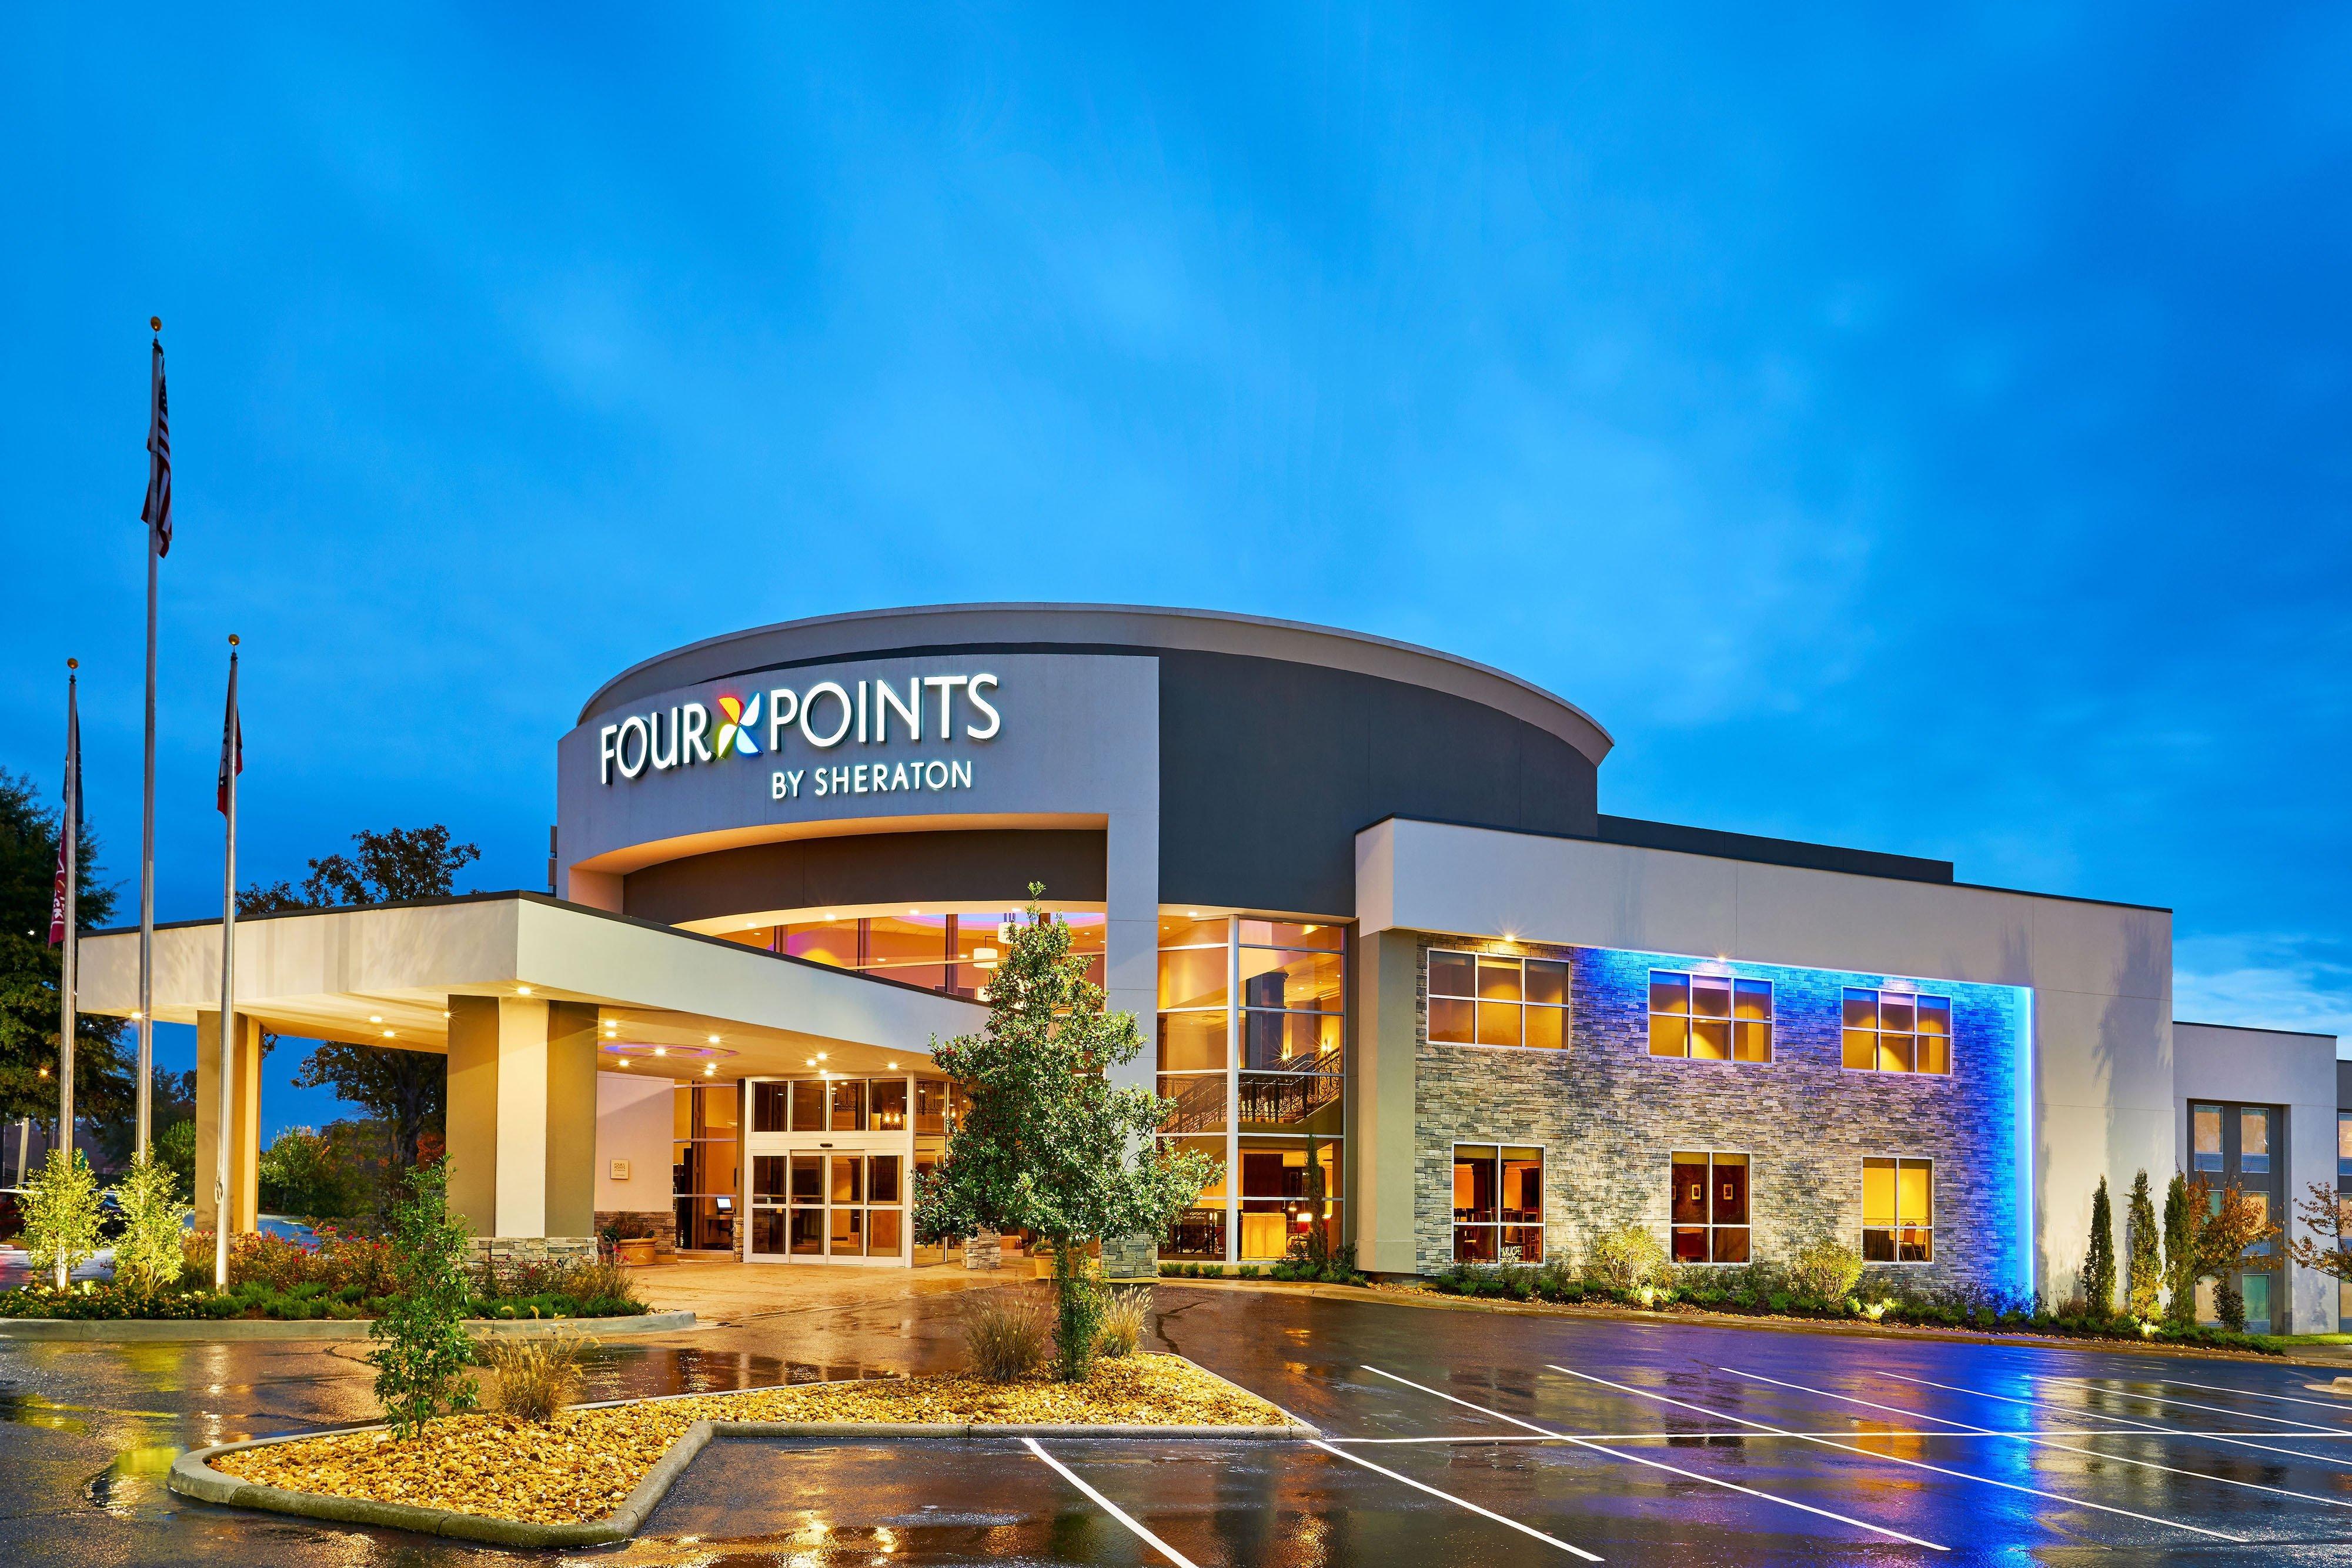 Four Points by Sheraton Midtown